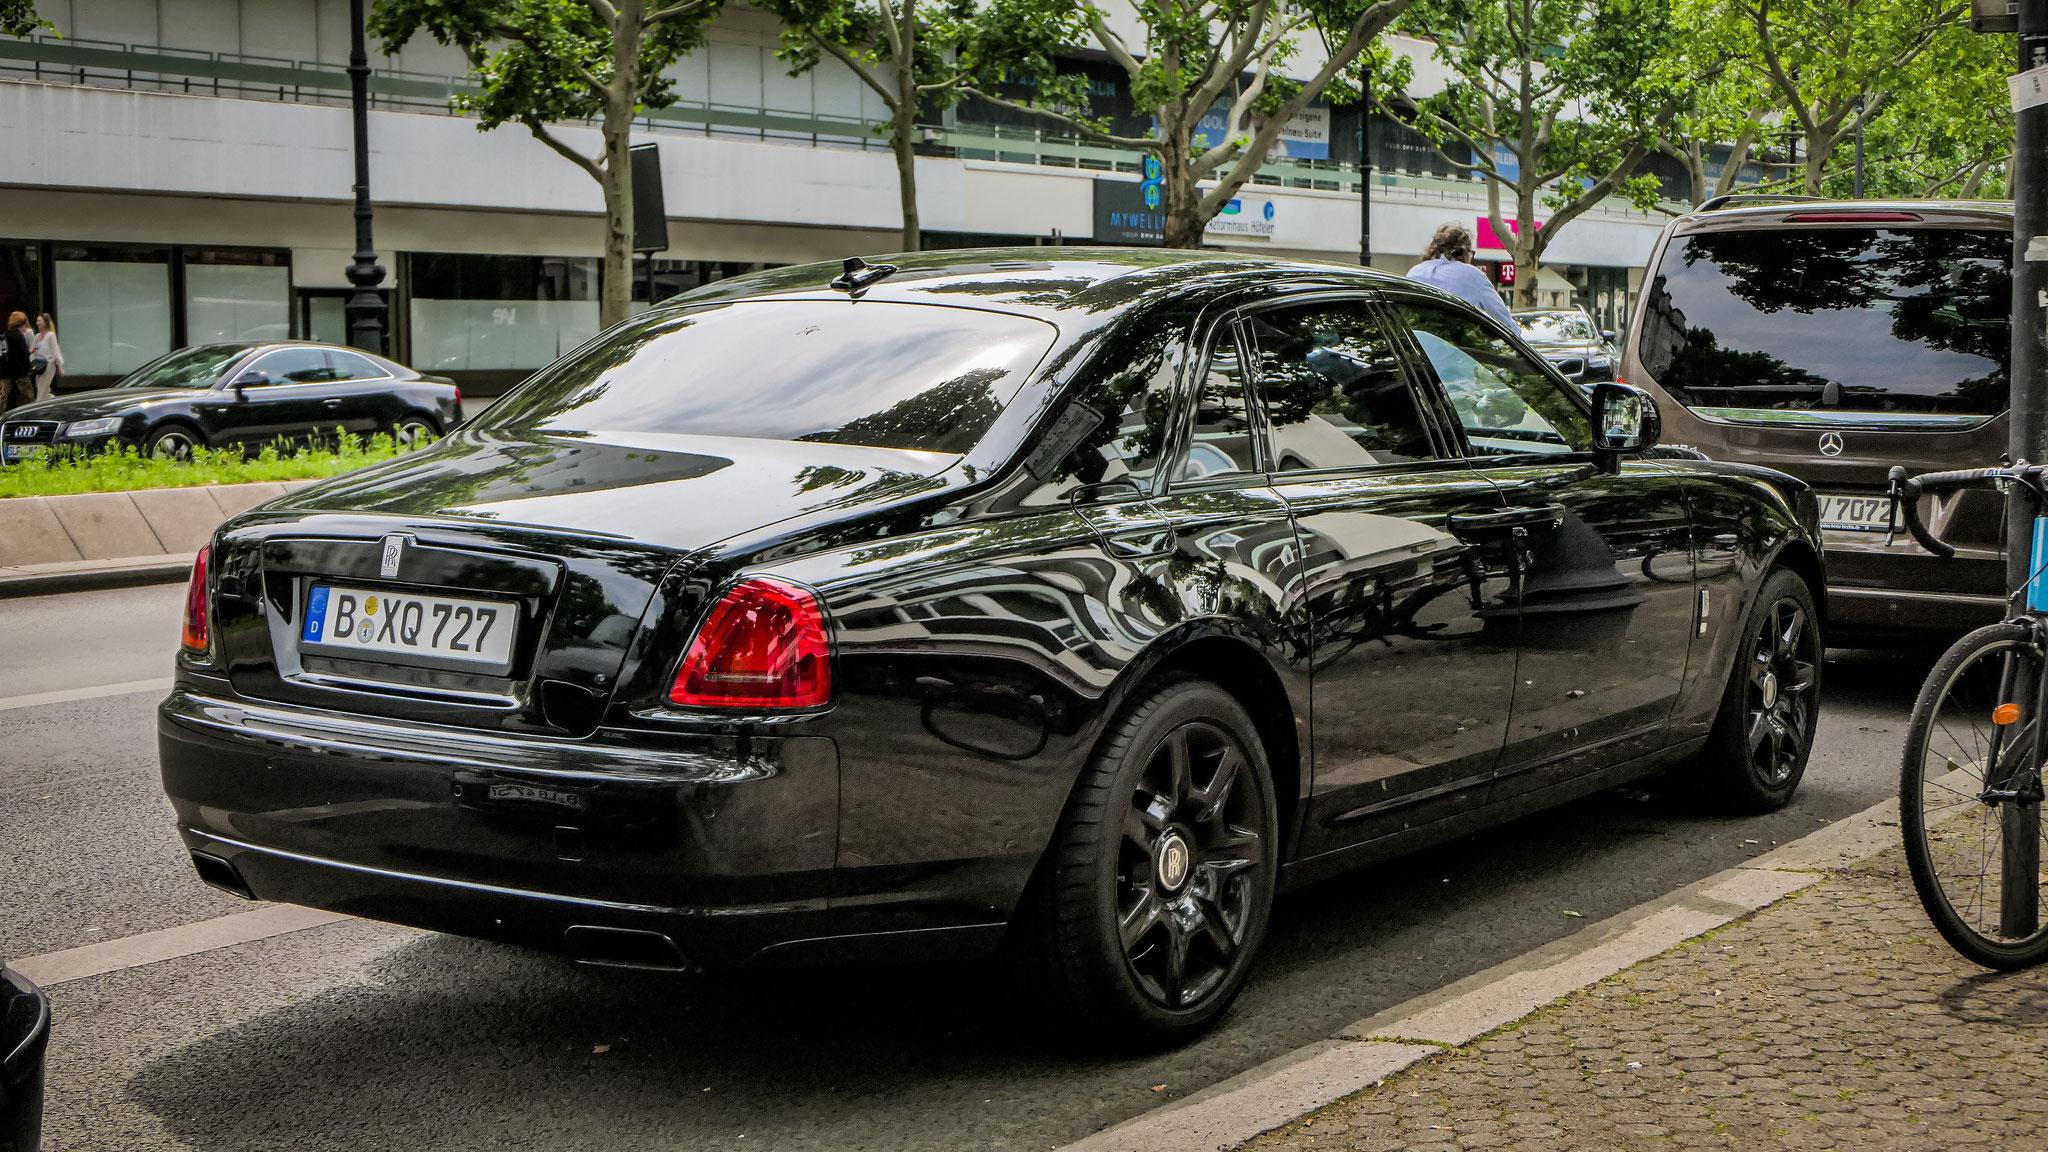 Rolls Royce Ghost - B-XQ-727